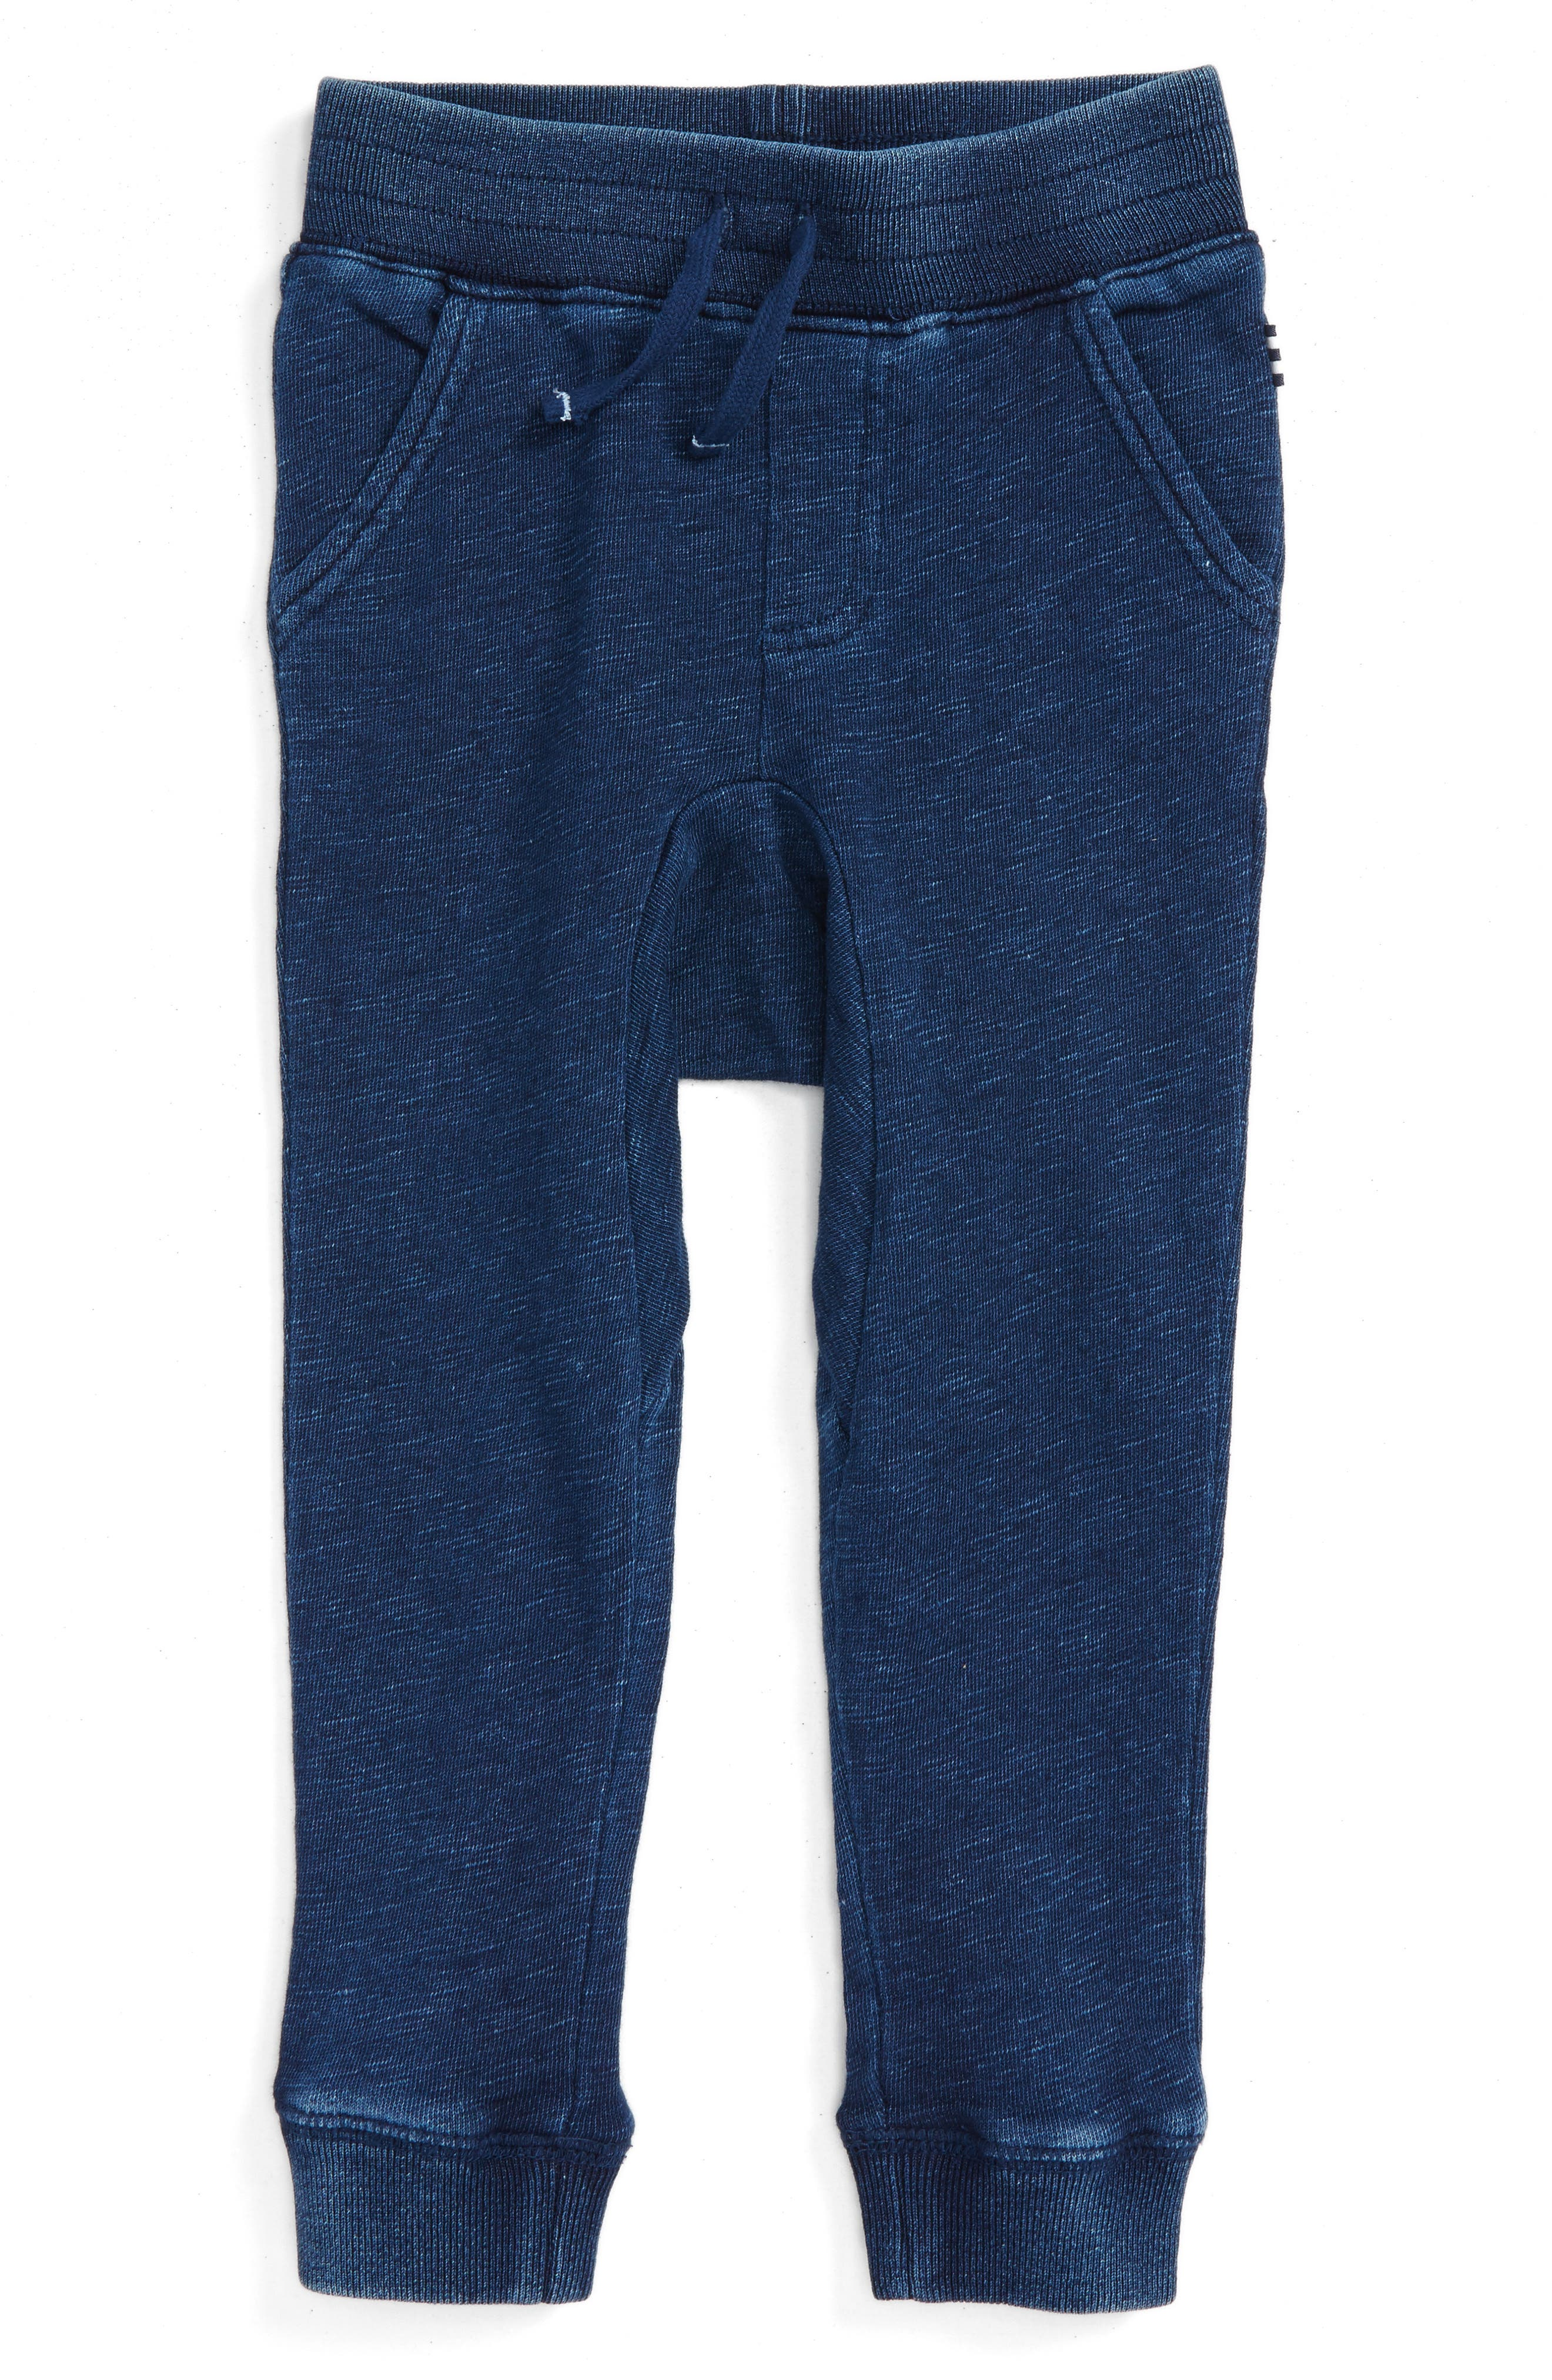 Alternate Image 1 Selected - Splendid Double Knit Jogger Pants (Toddler Boys & Little Boys)